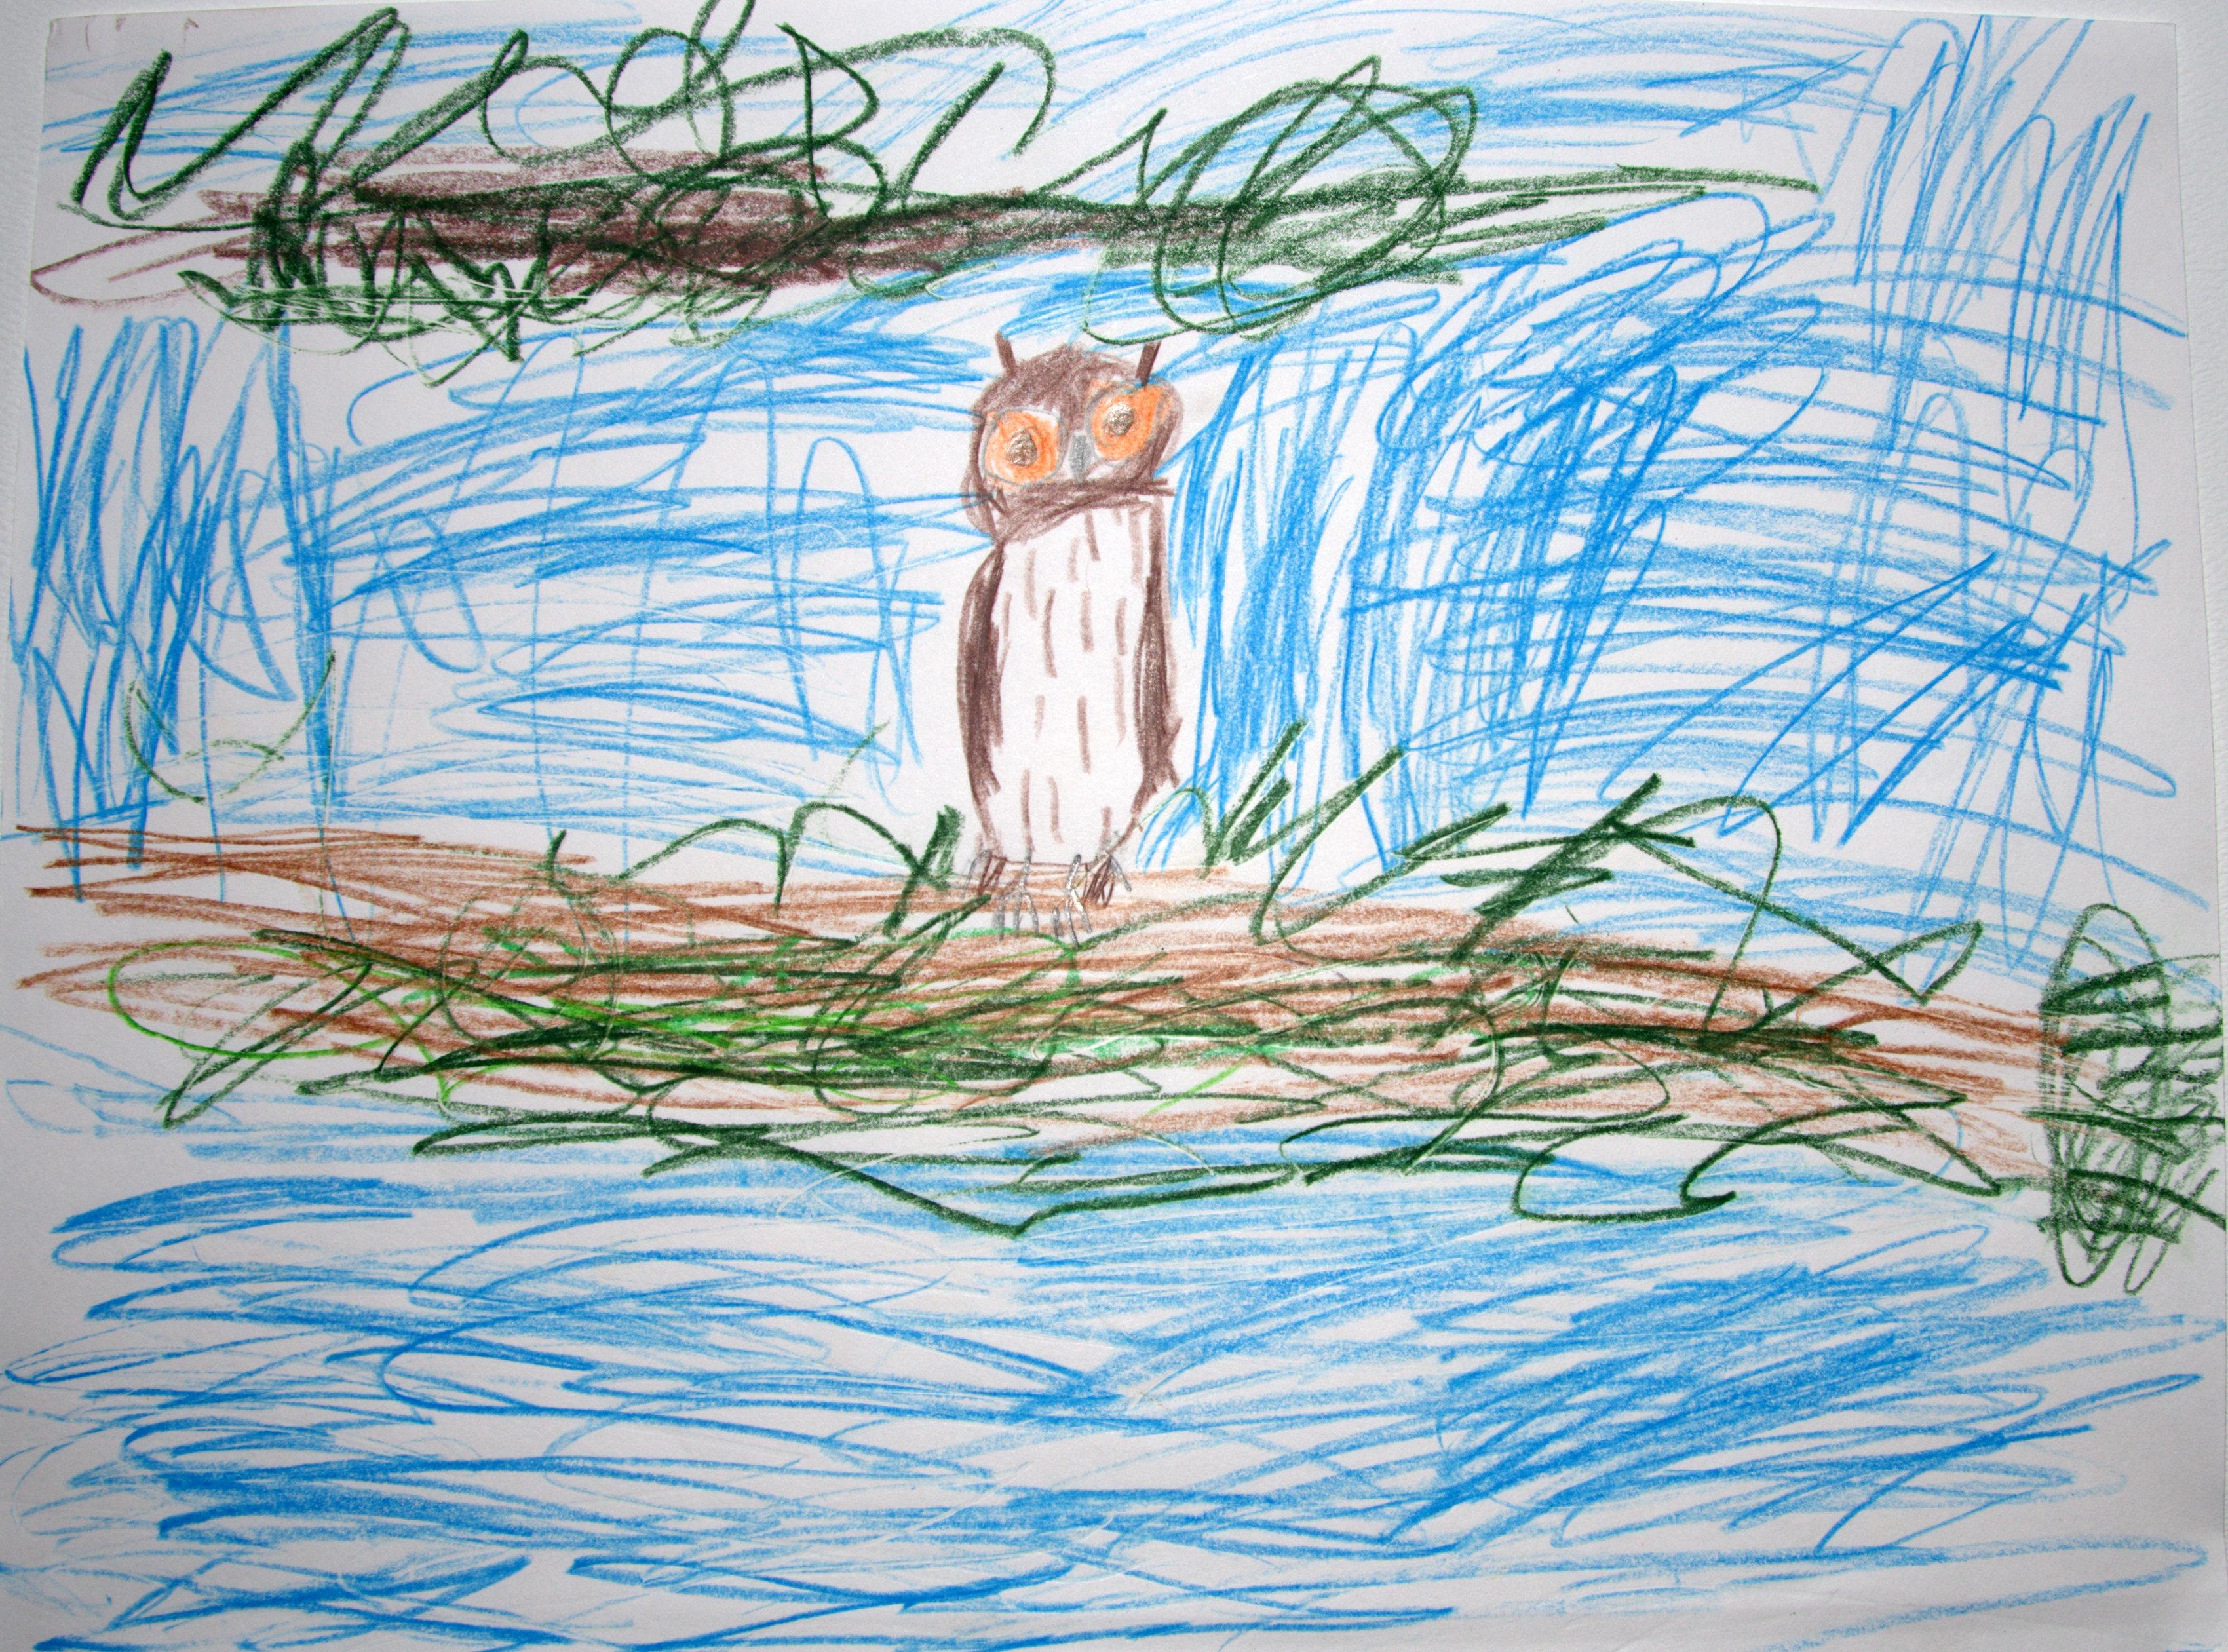 Bennett Dowers, Age 7